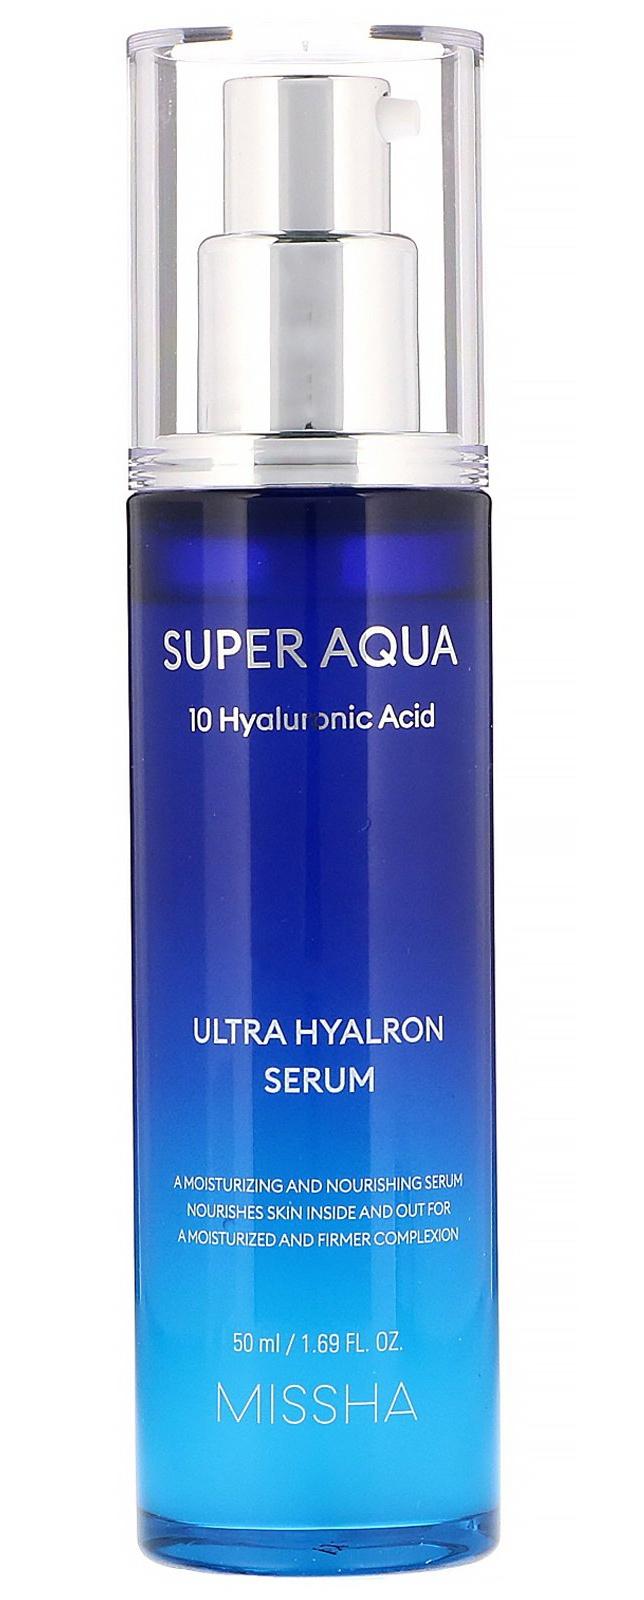 Missha Super Aqua Ultra Hyalron Serum